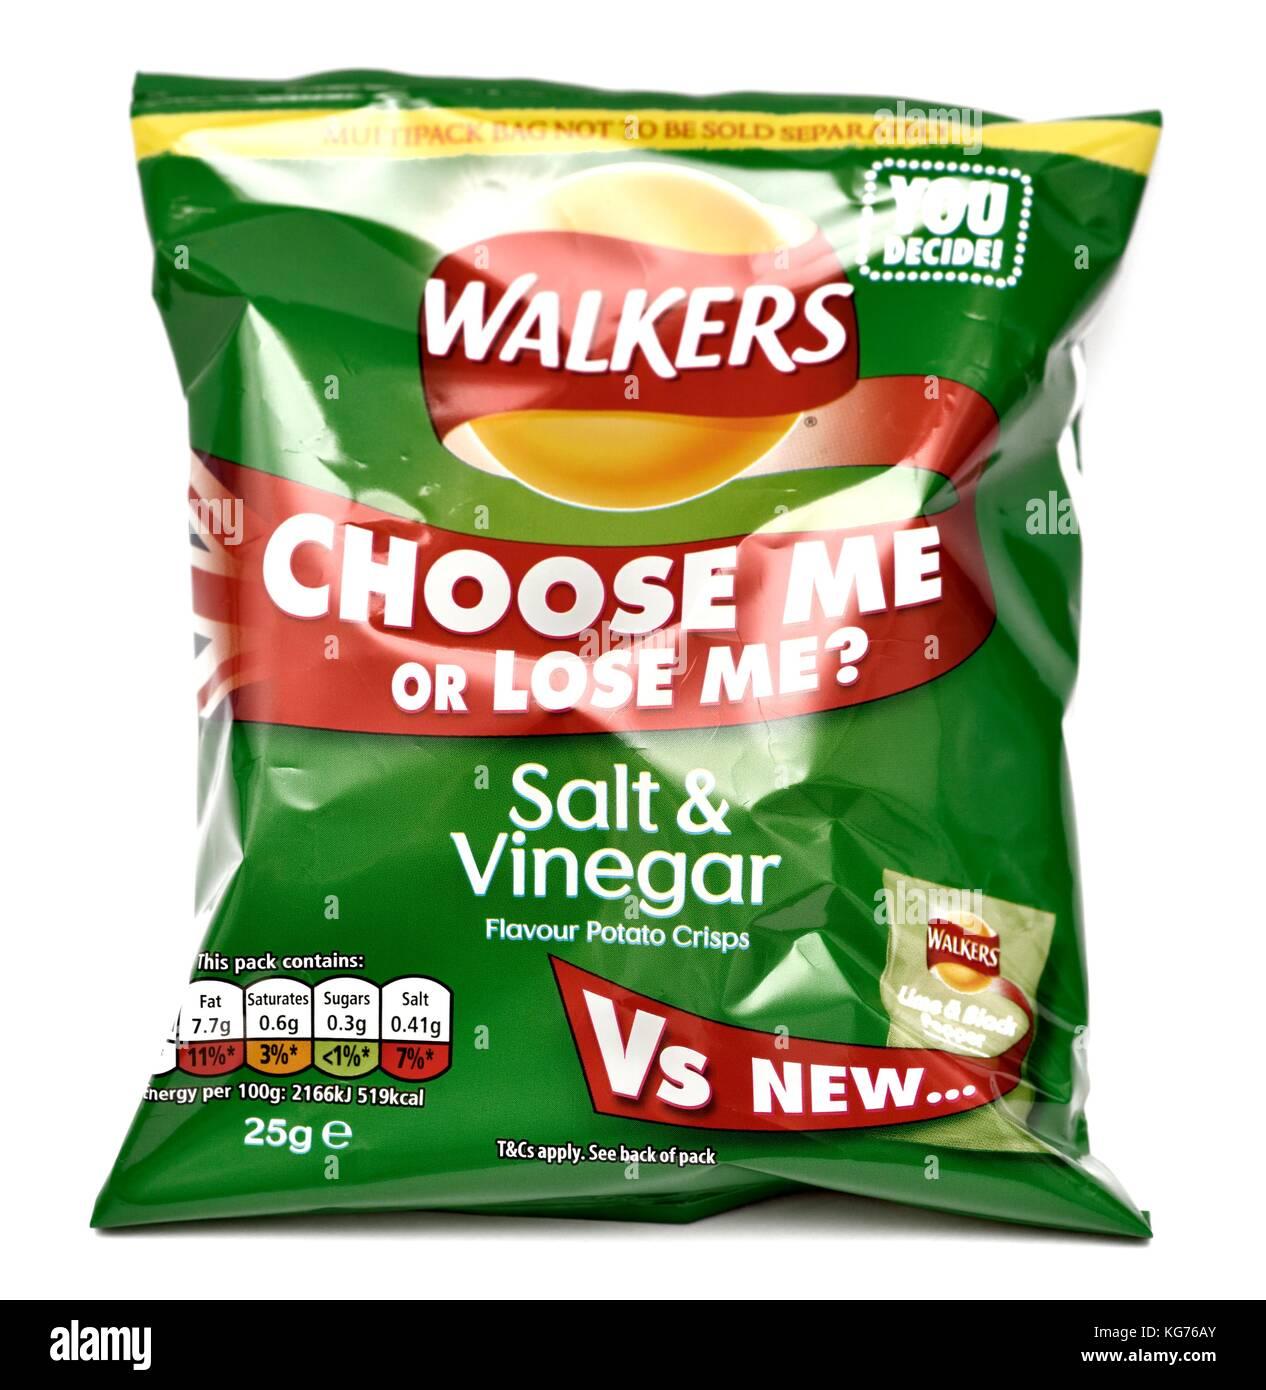 Walkers salt and vinegar crisps 25g - Stock Image